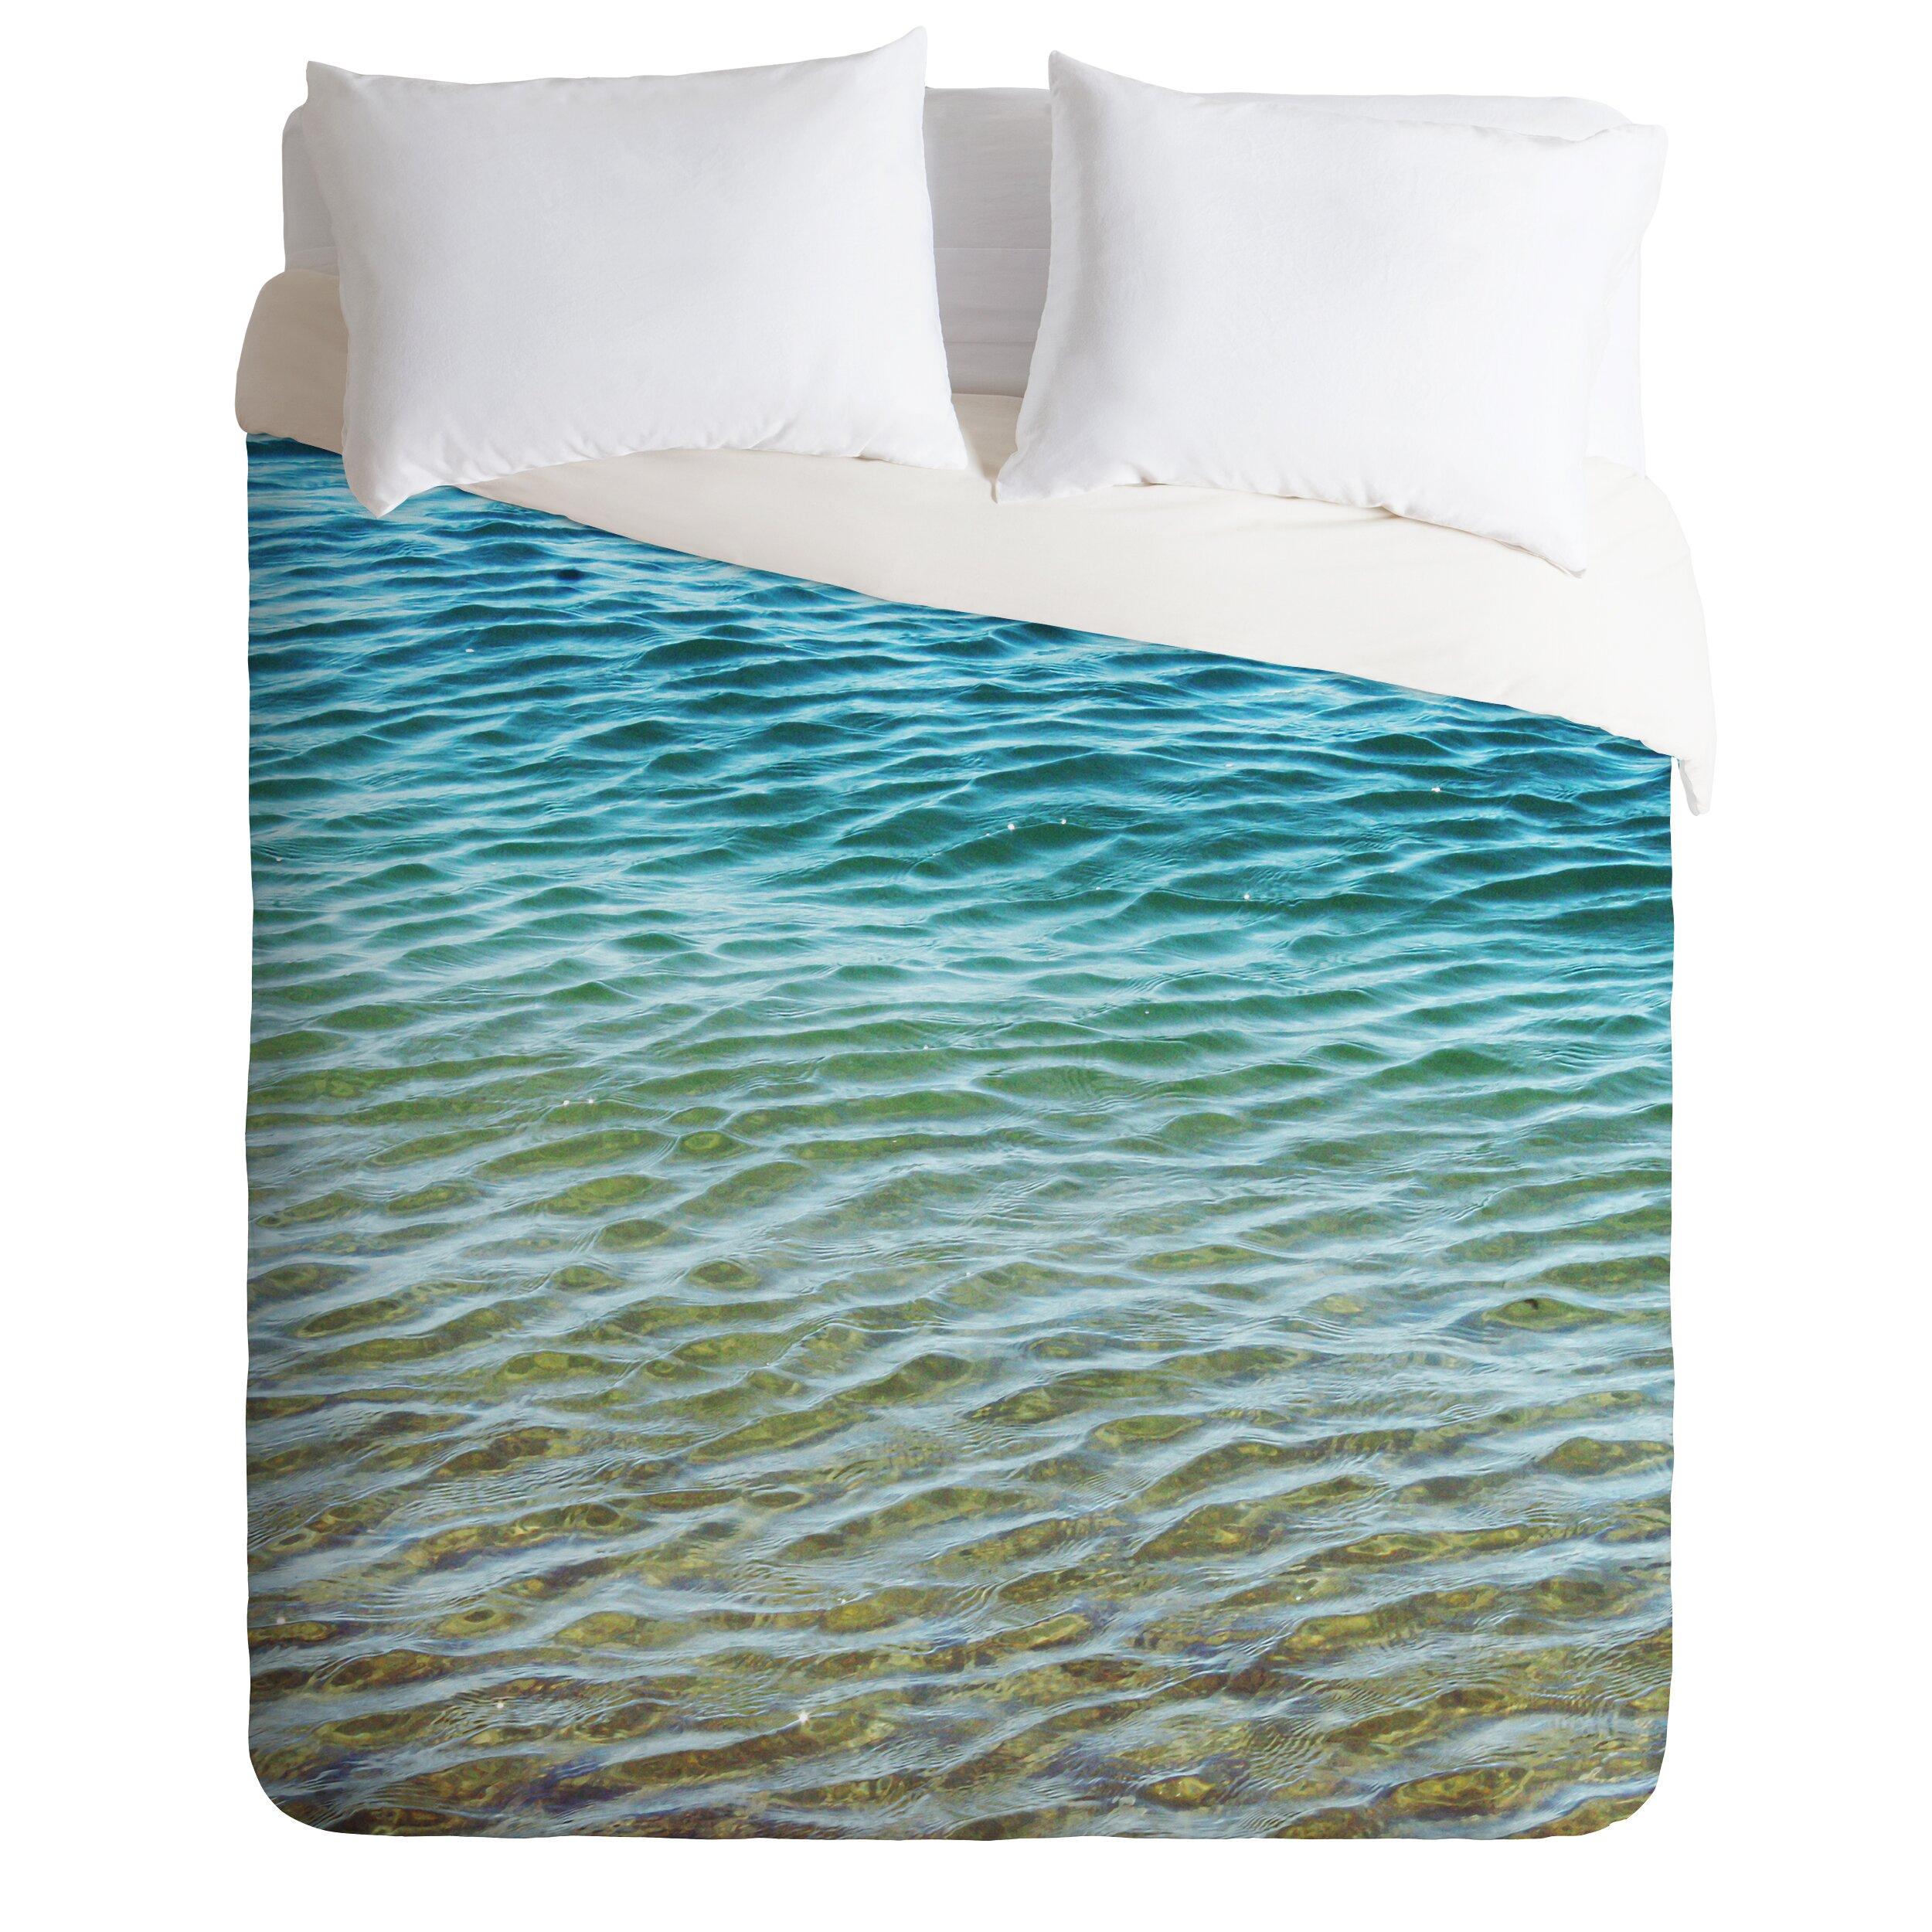 Brayden studio meunier ombre sea duvet cover reviews for Studio one bed cover